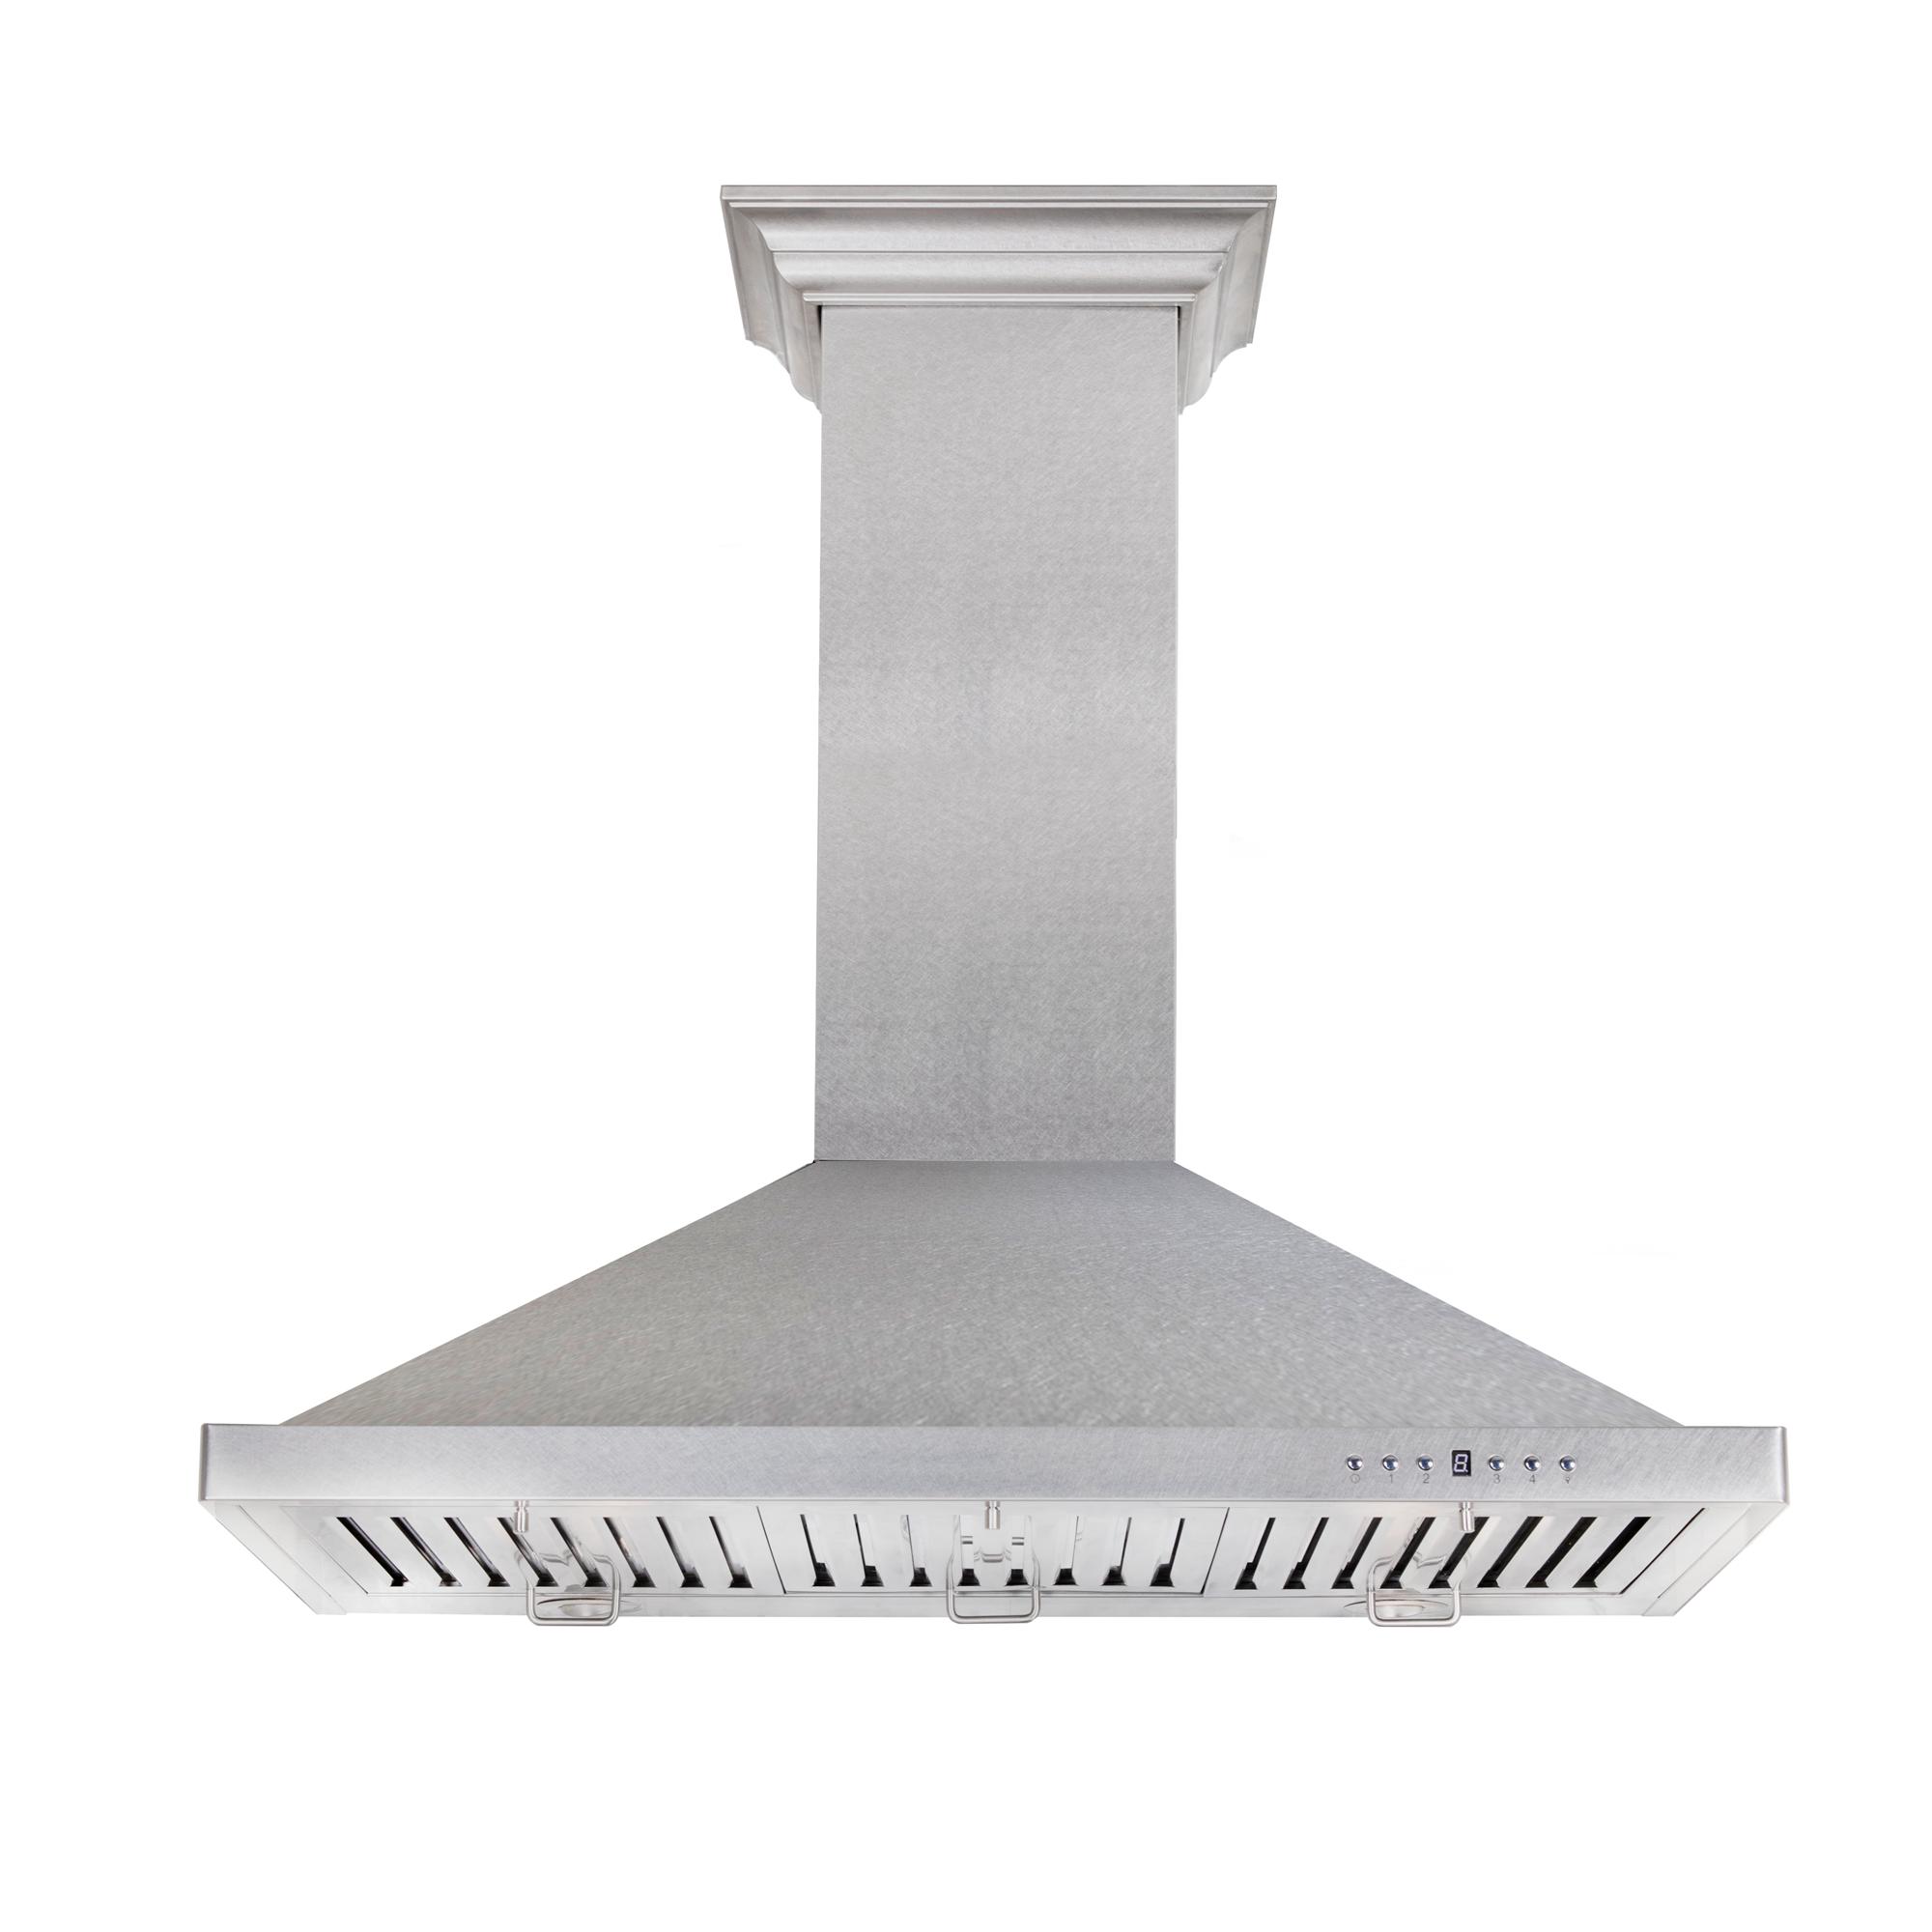 zline-snow-stainless-steel-wall-mounted-range-hood-8KBS-front-under.jpg